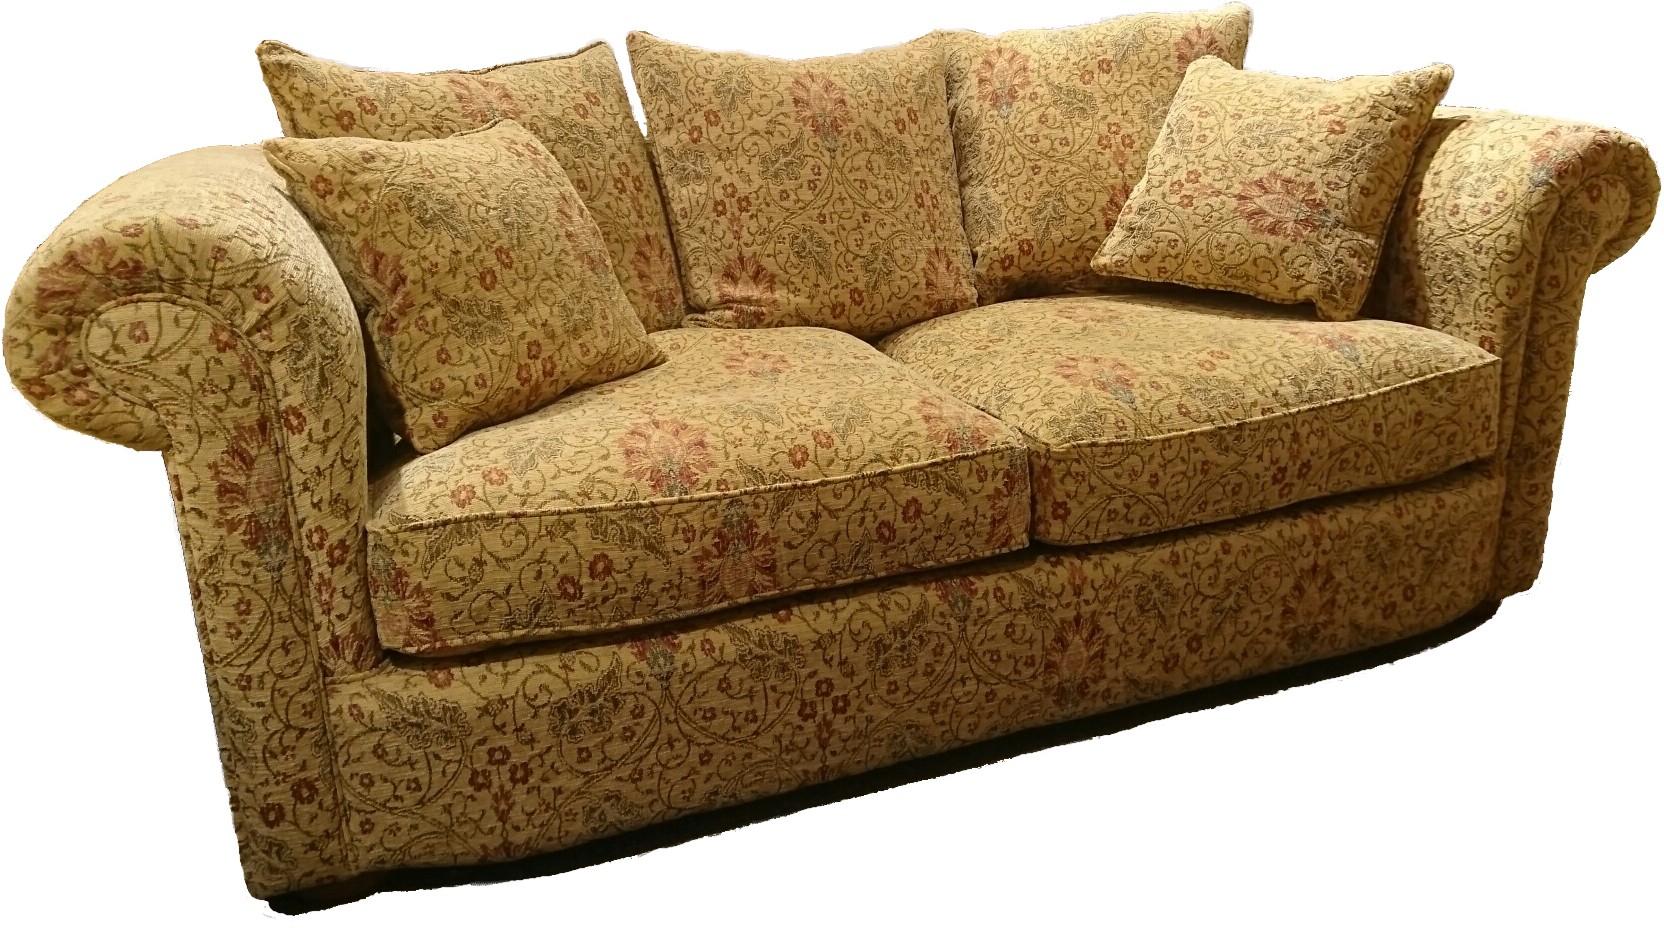 Richmond Fabric 2 Seater Sofa – Old Creamery Furniture With Regard To Richmond Sofas (View 1 of 15)